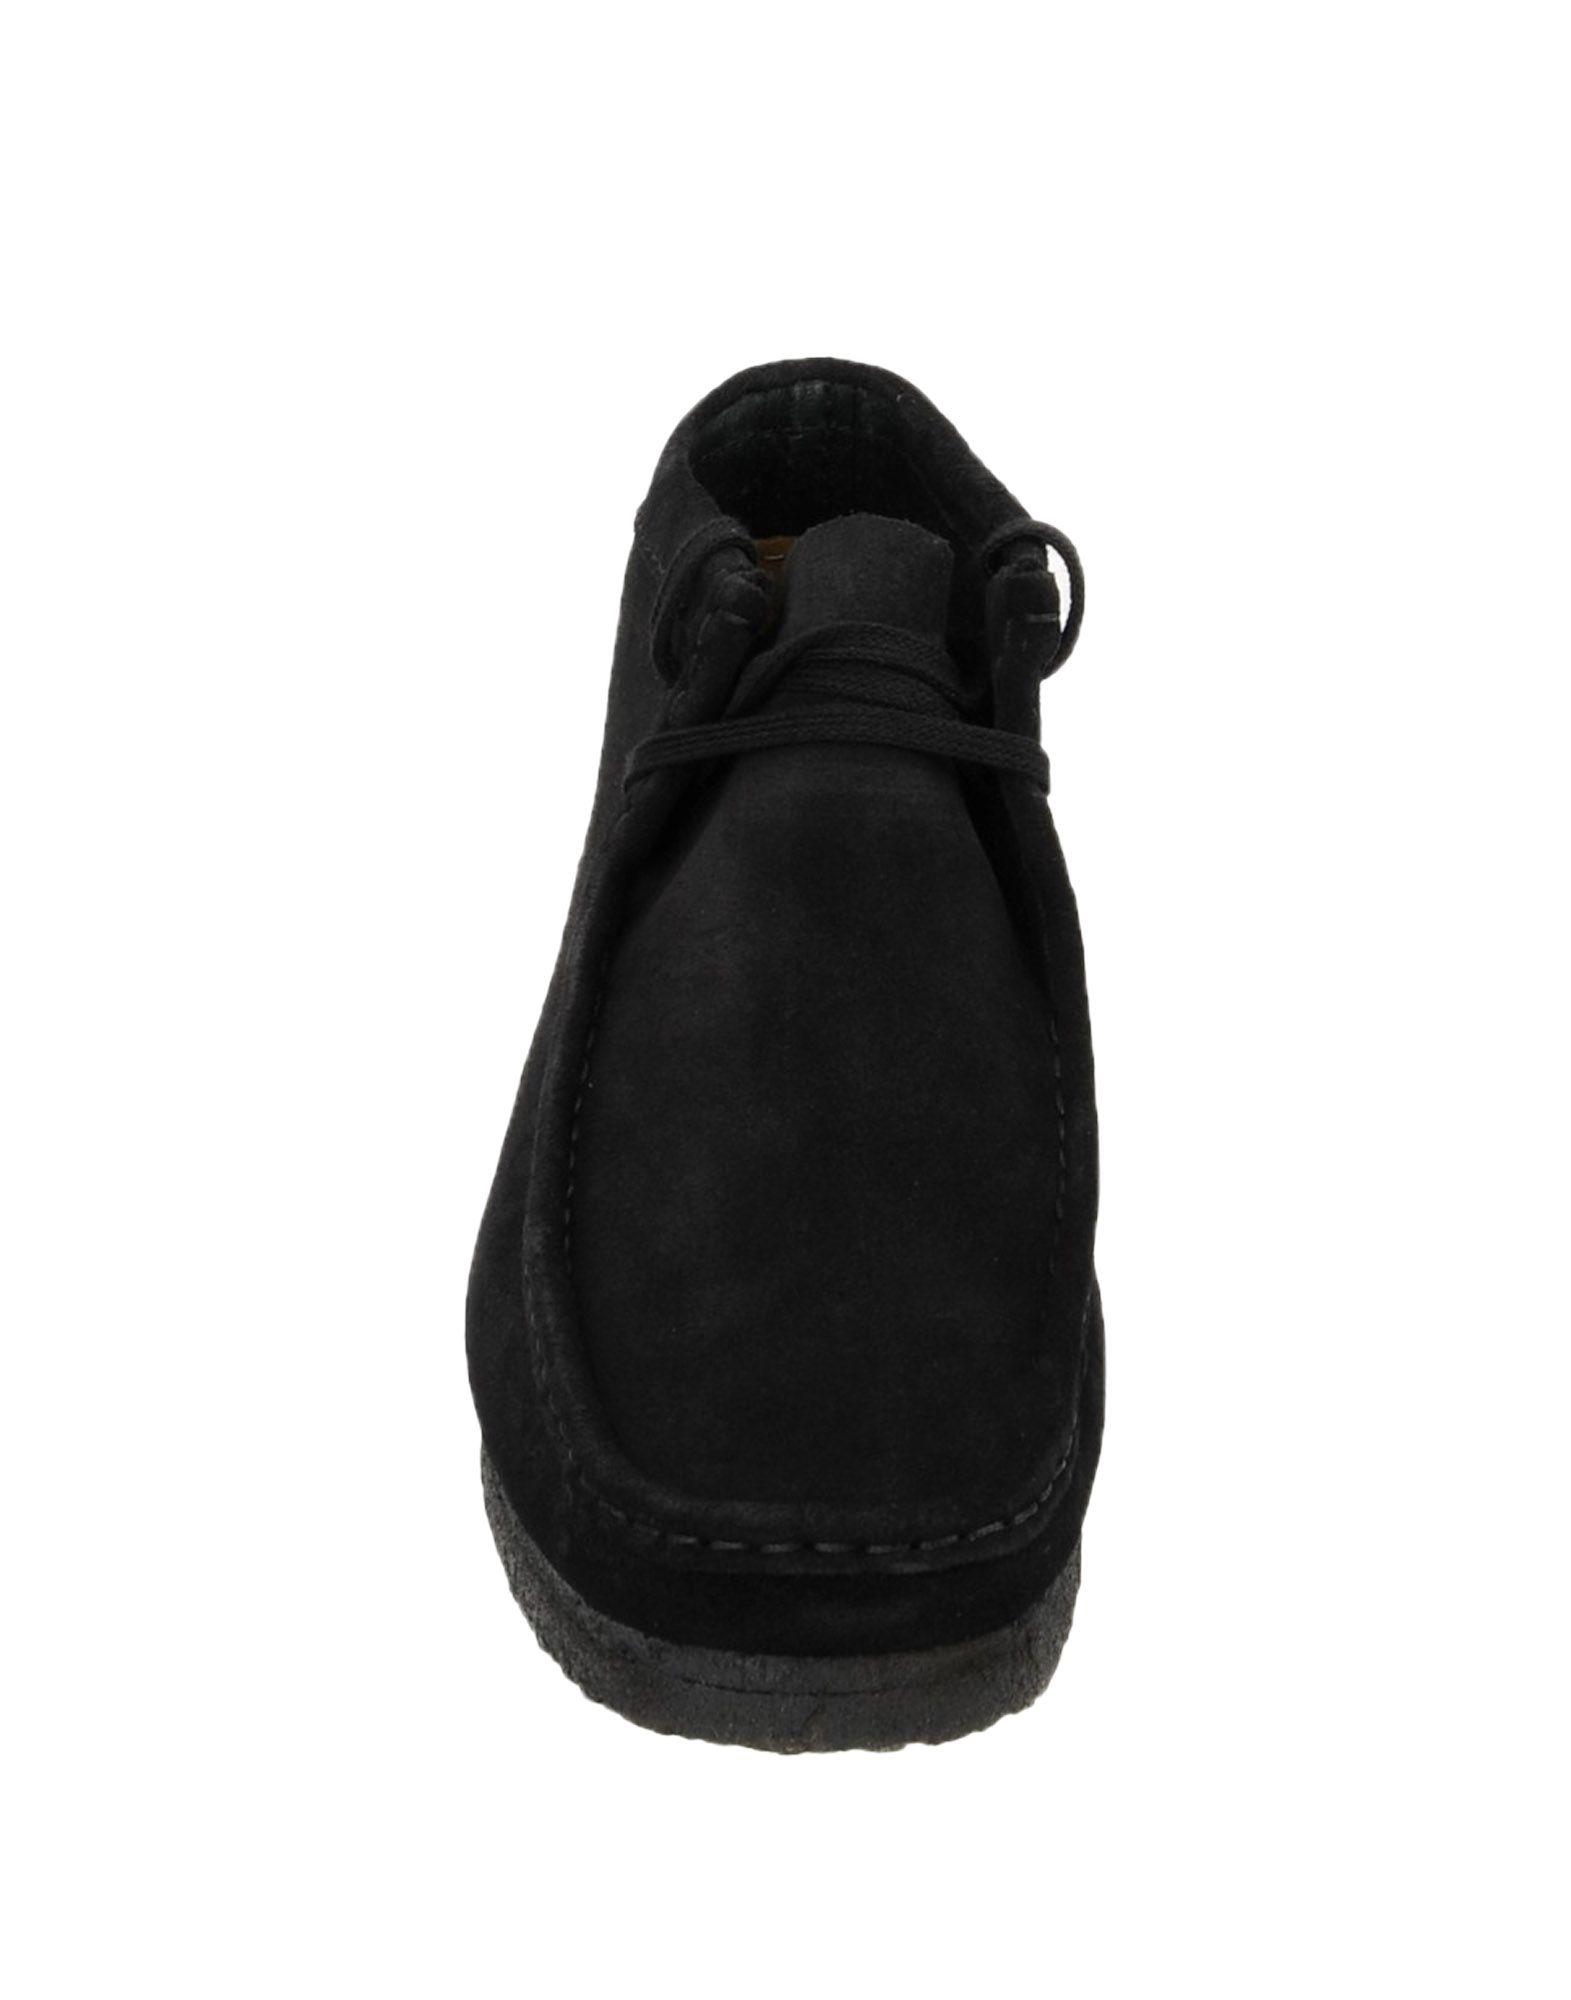 Clarks Originals Wallabee Boot 11338398EK  11338398EK Boot e1035f